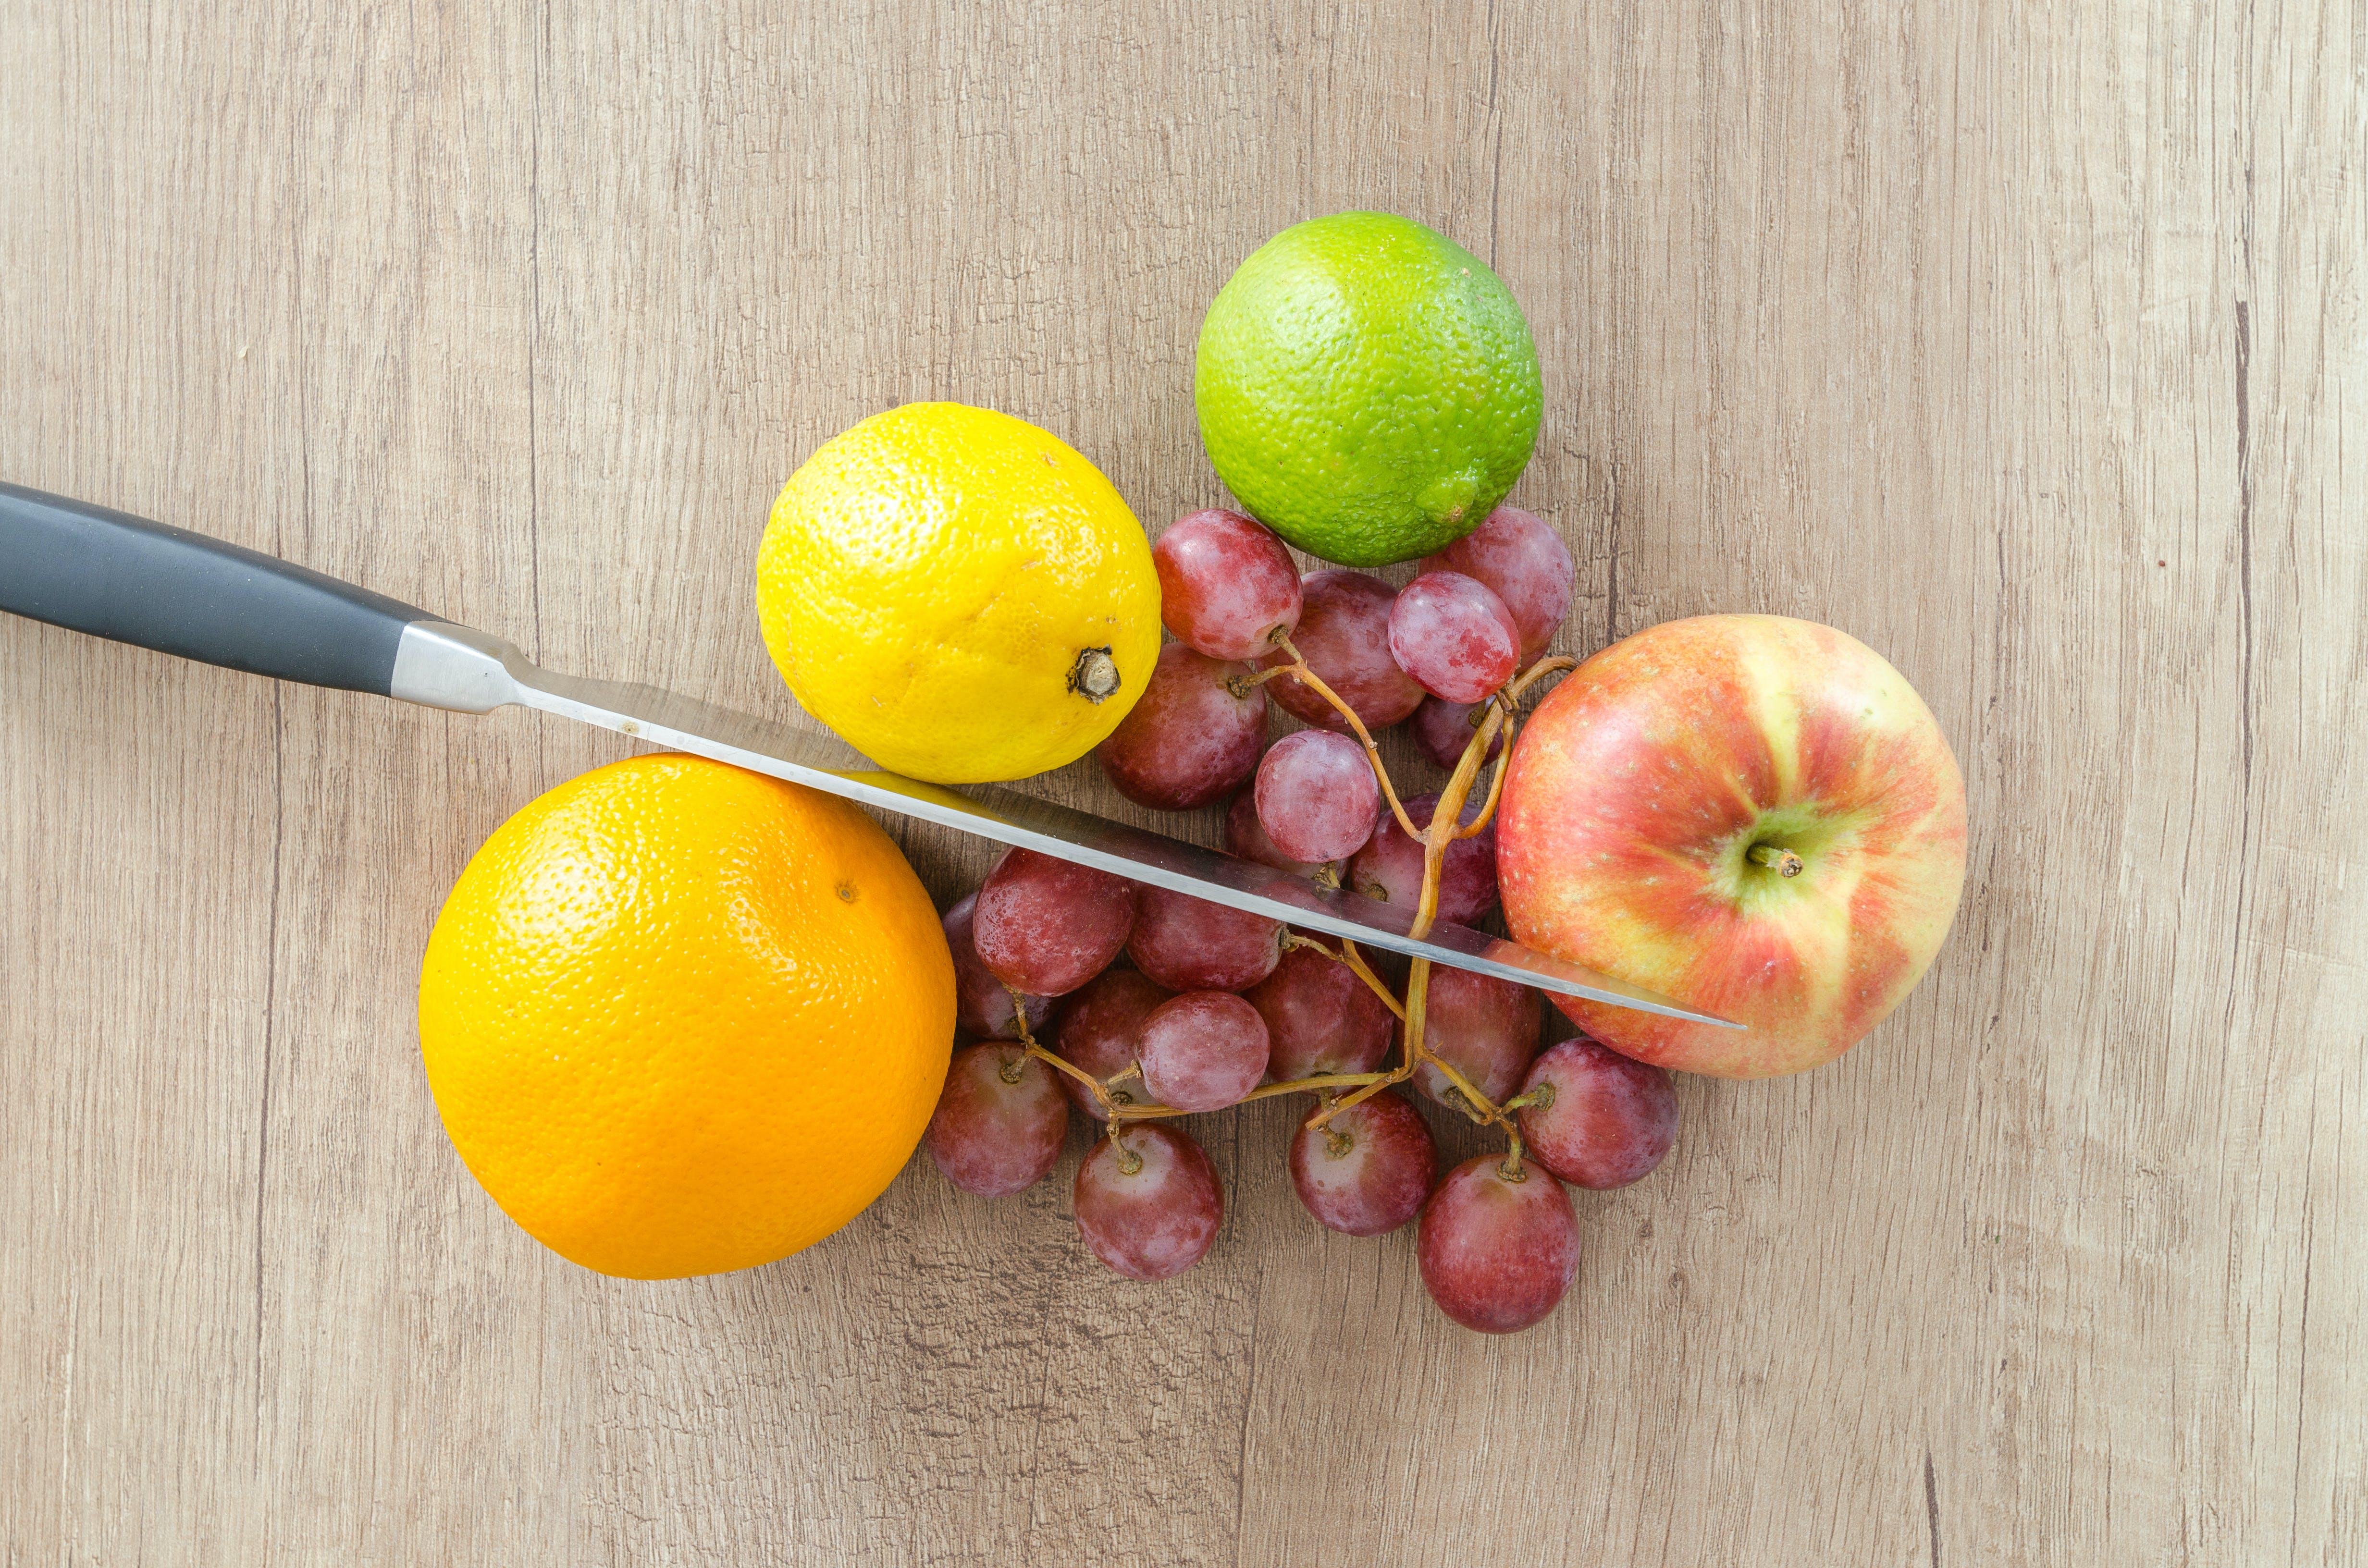 apple, citrus, citrus fruits